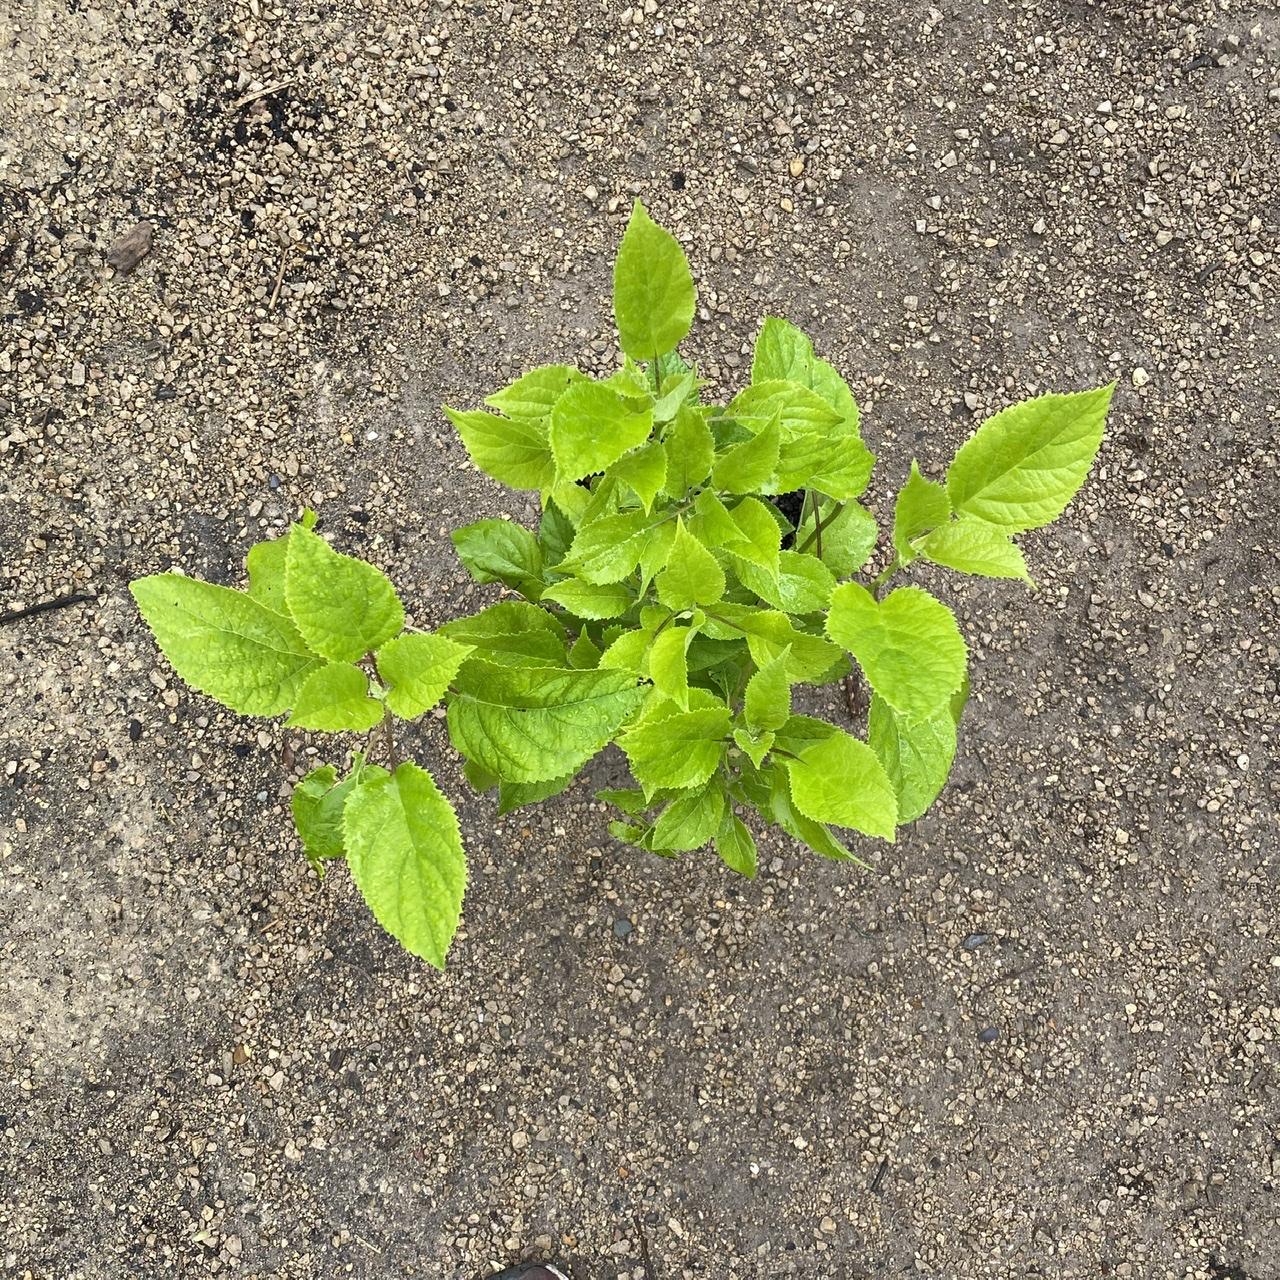 Hydrangea 'Annabelle' (White mop head hydrangea)